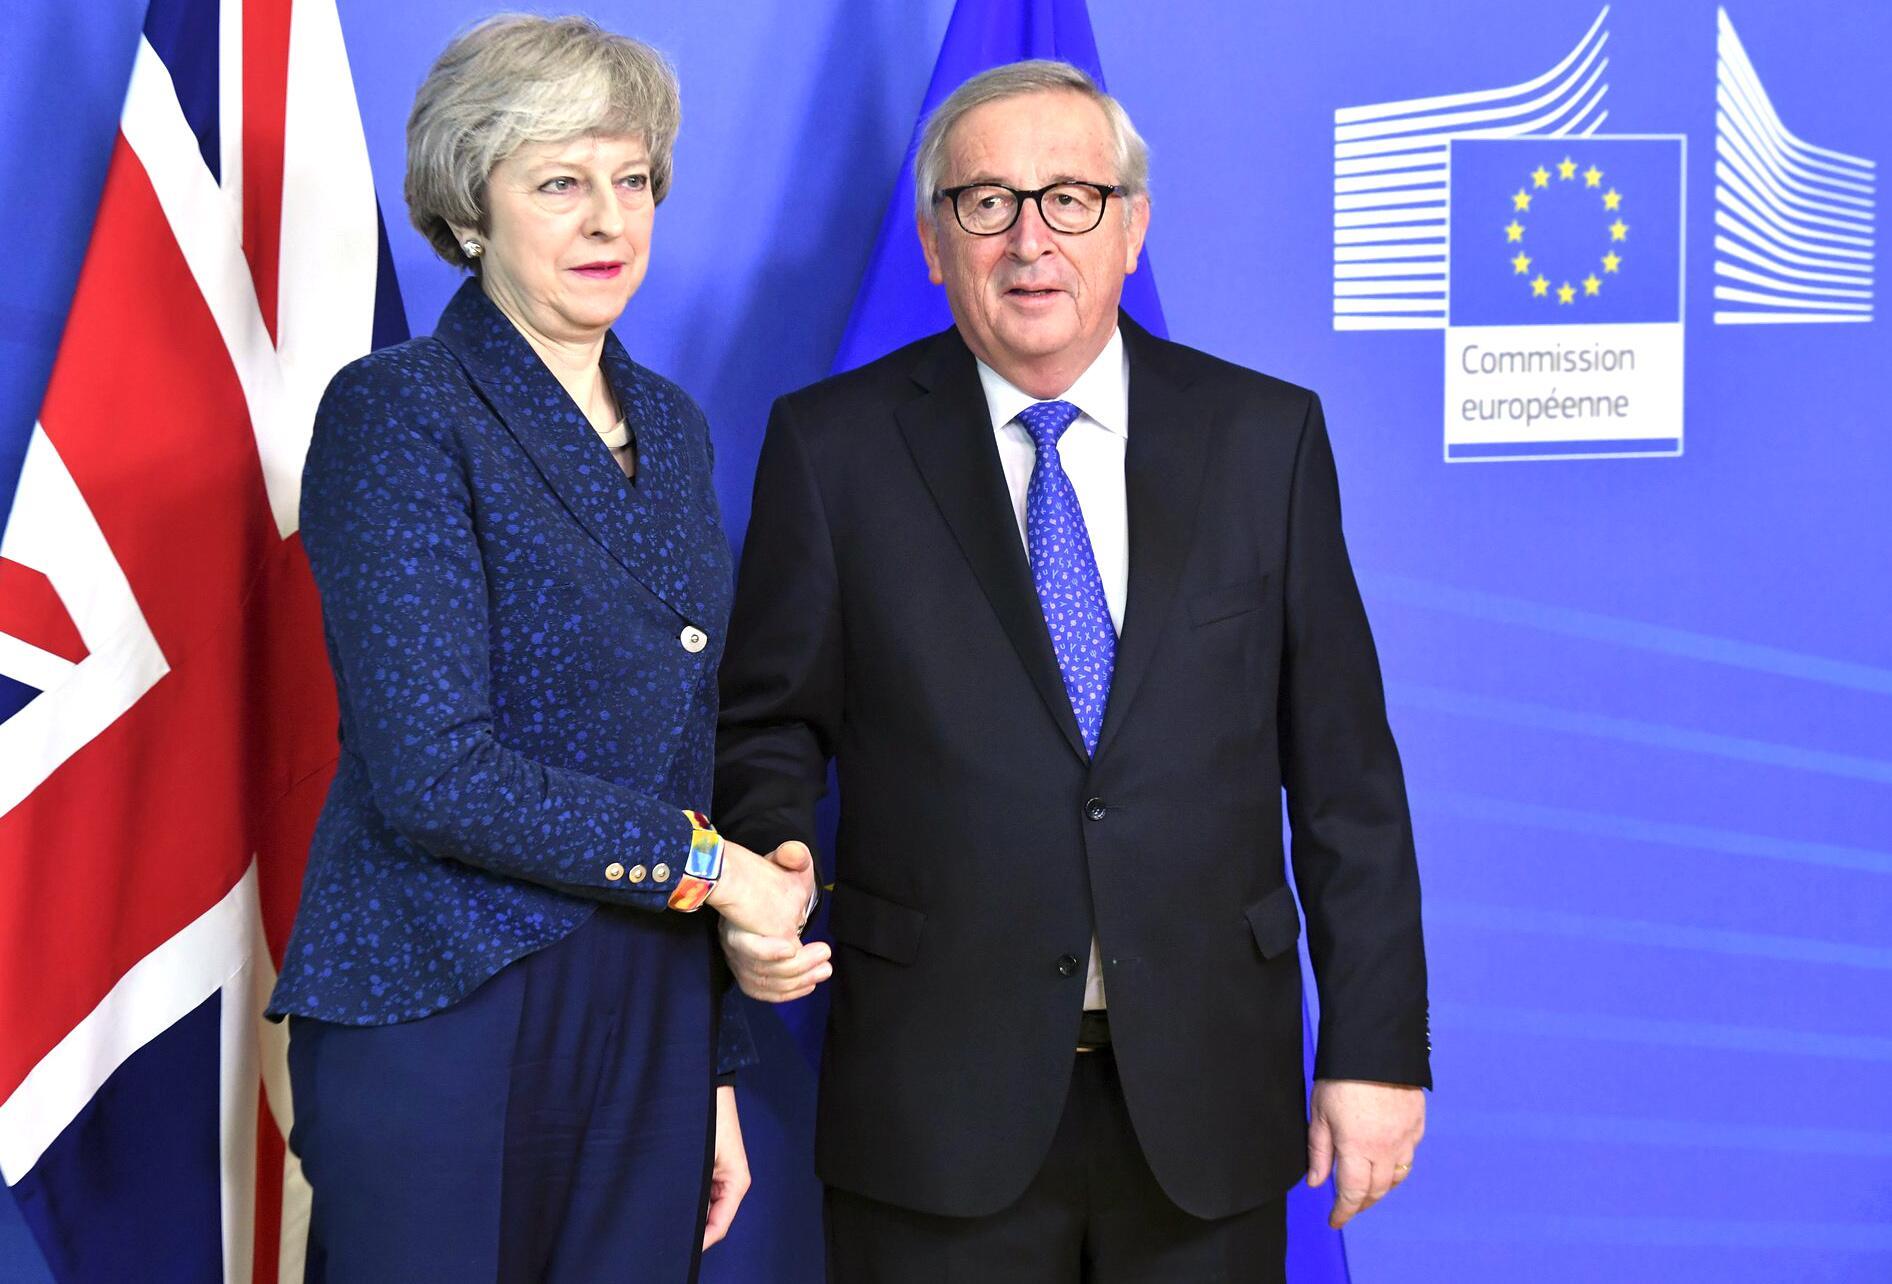 Bild zu Theresa May, Jean-Claude Juncker, EU, Brüssel, Brexit, Gespräche